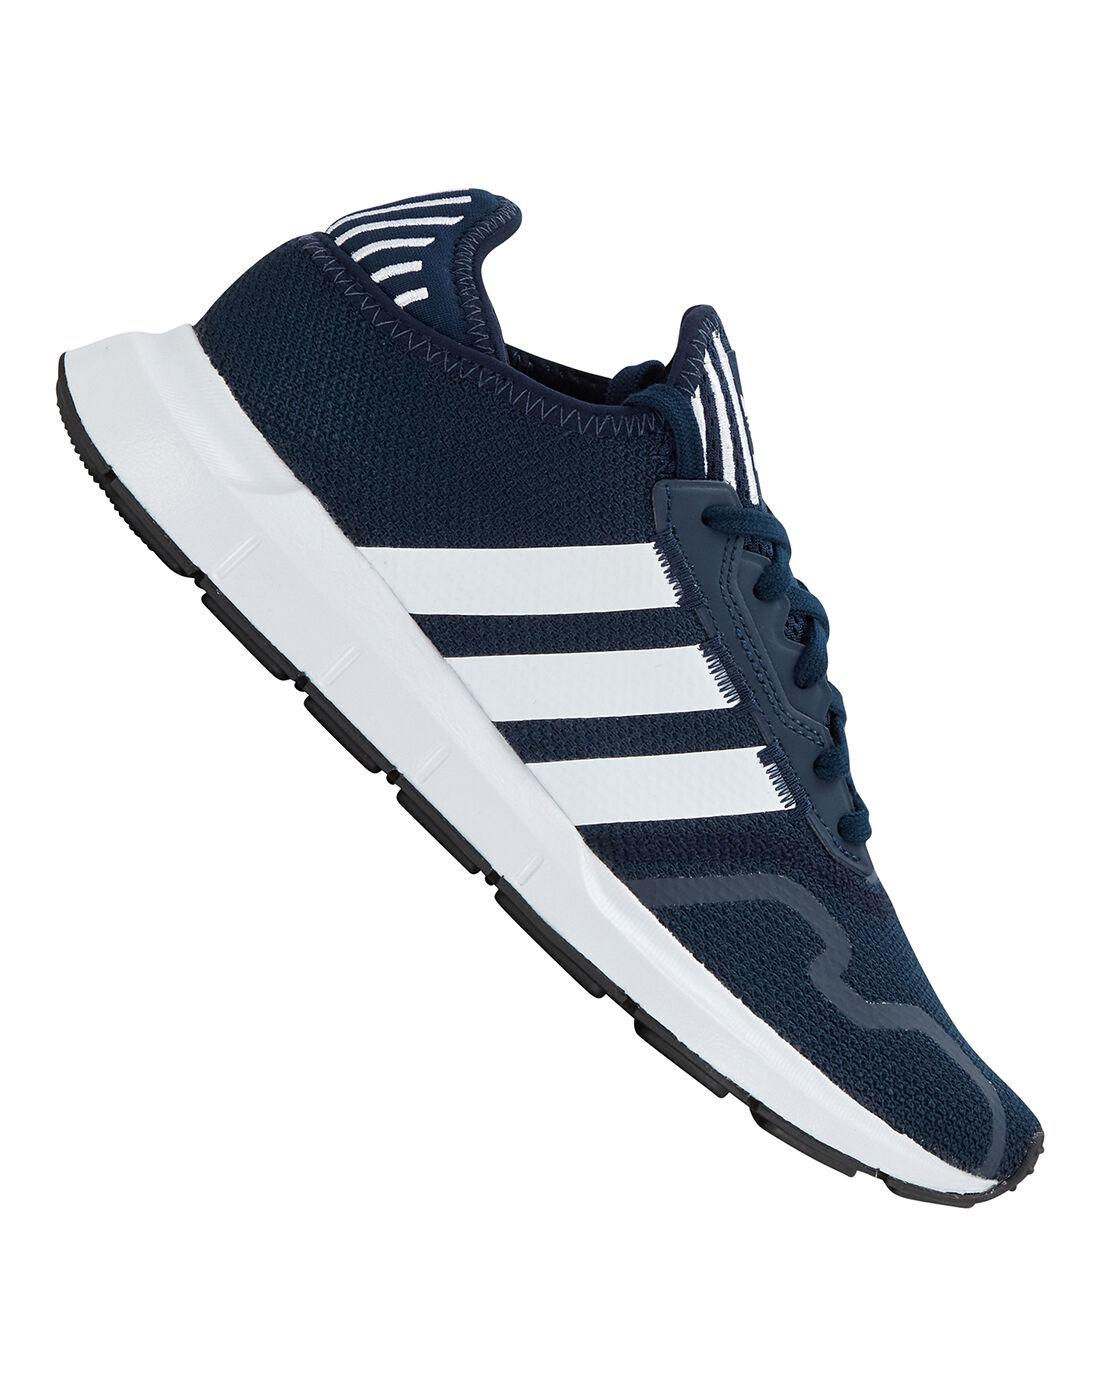 adidas Originals adidas zx flux shoes unisex af6324 women watches | Mens Swift Run X